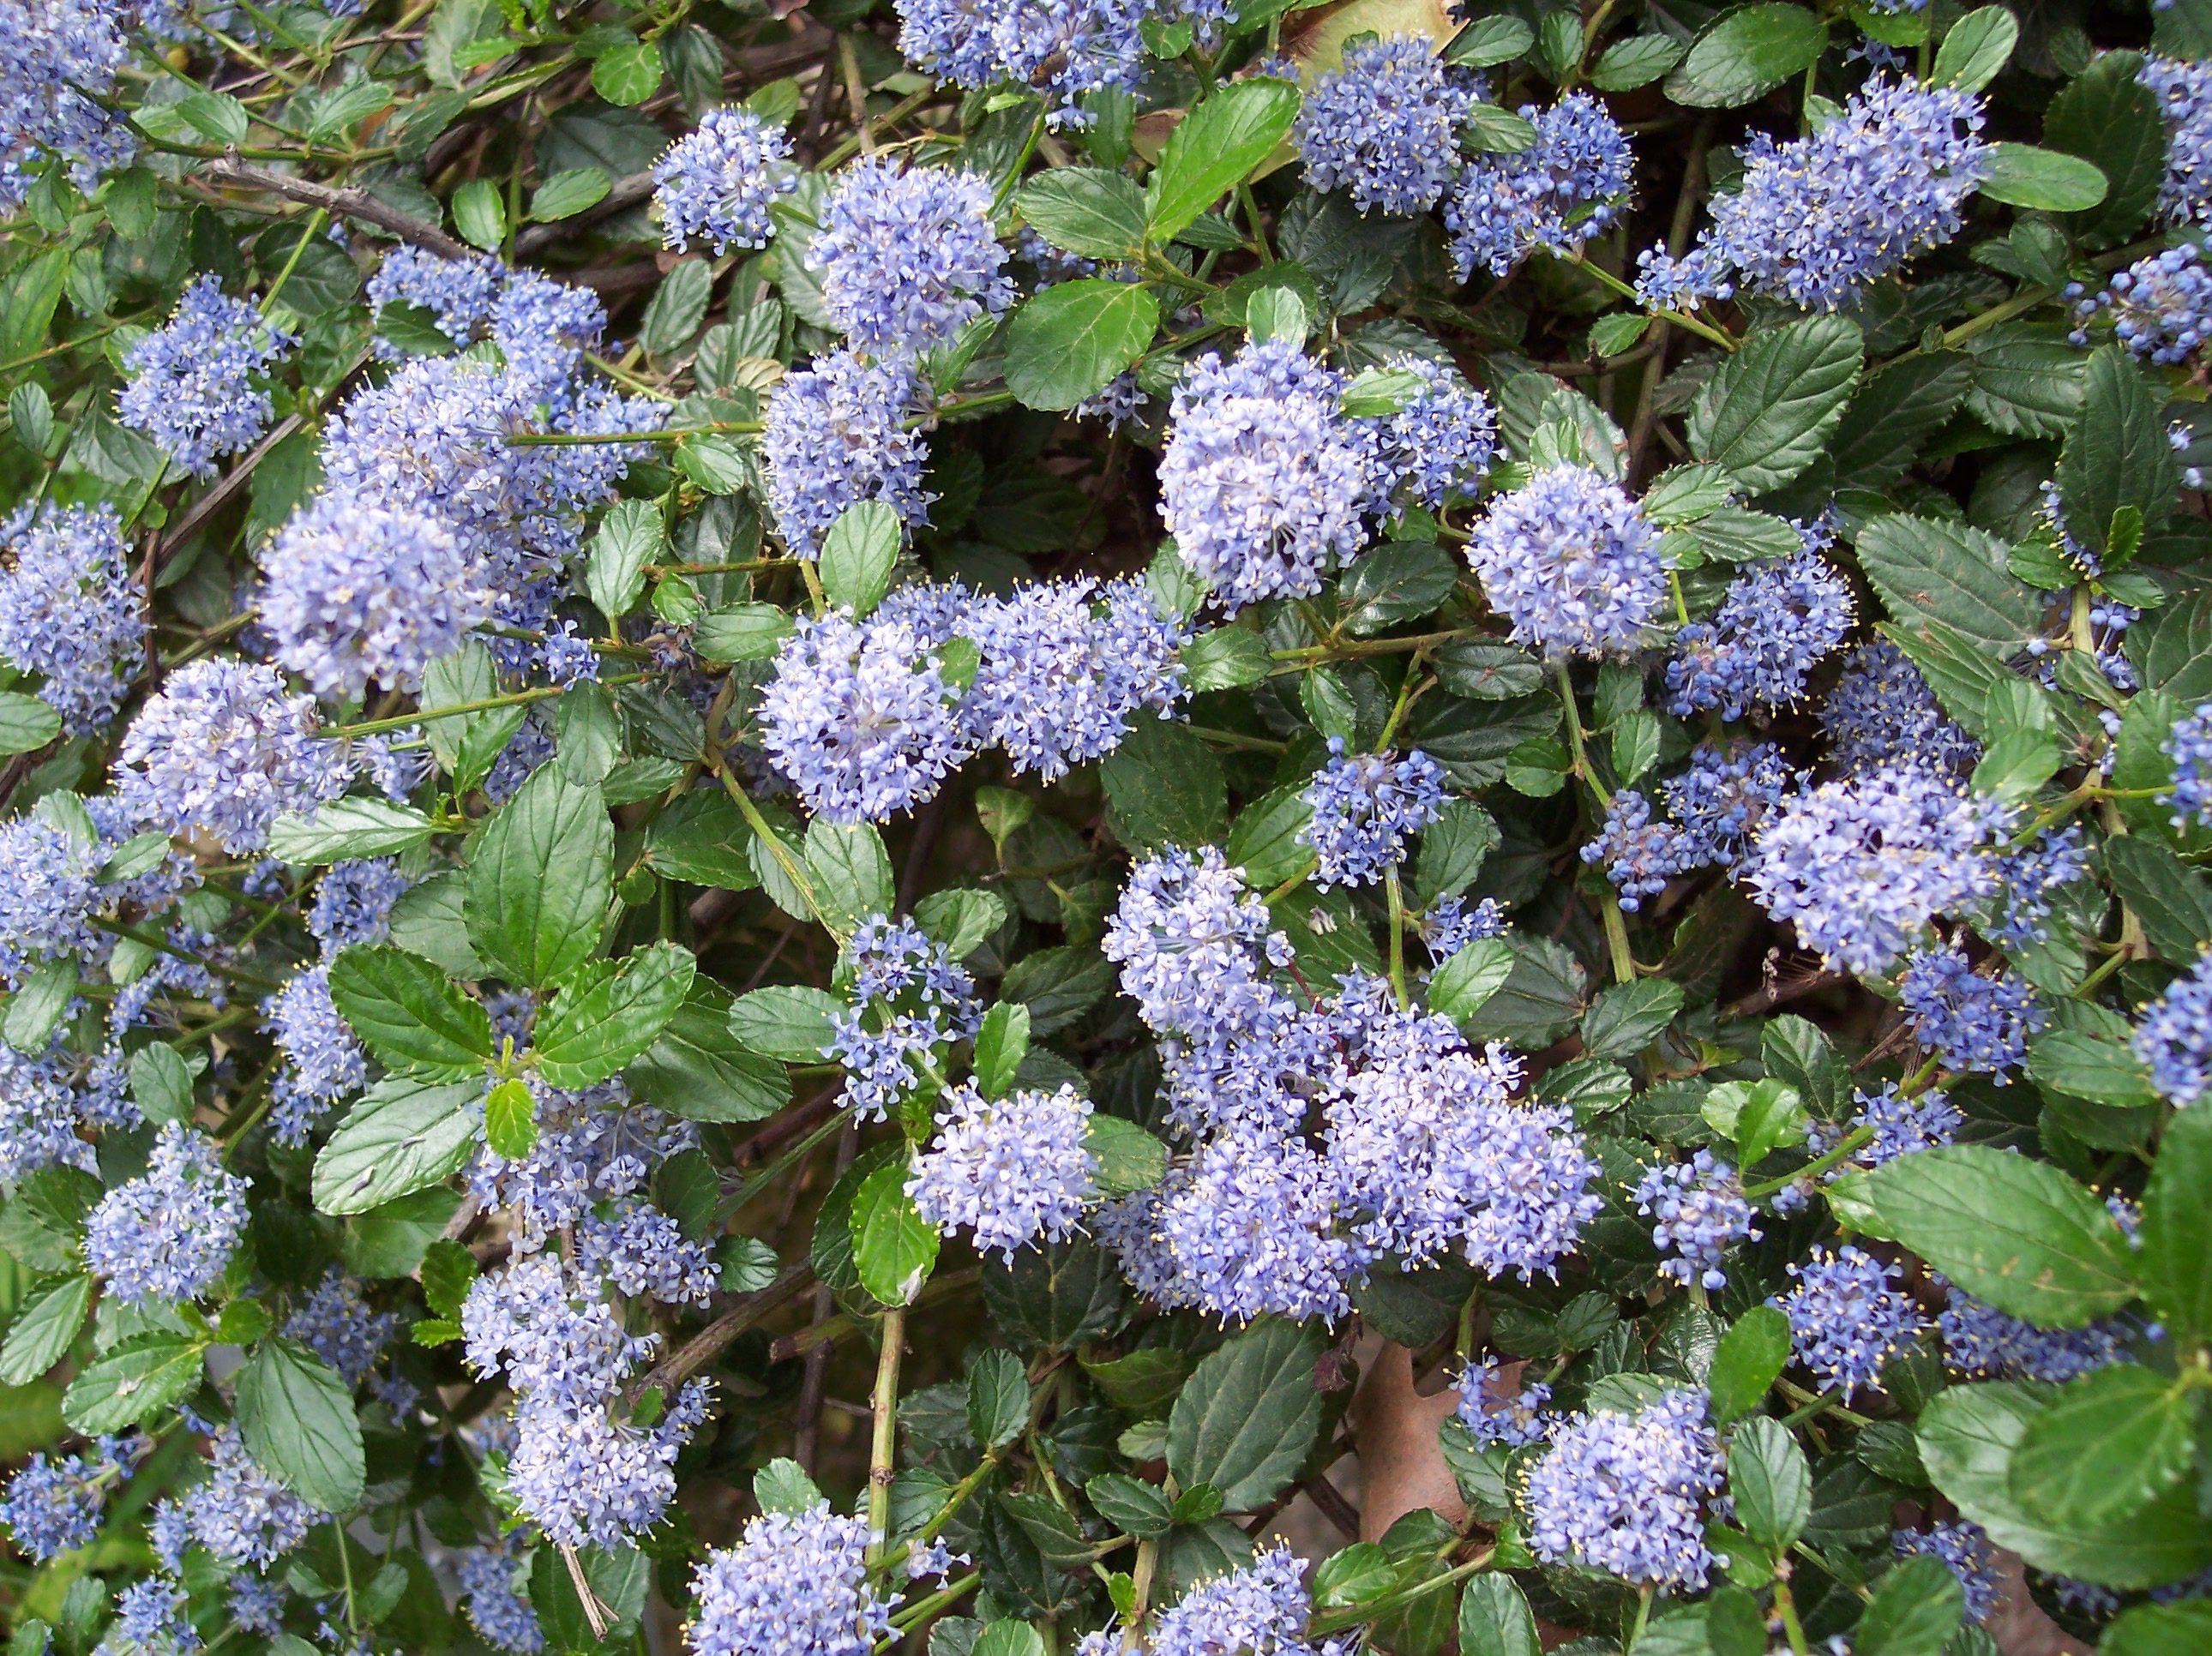 ceanothus thyrsiflorus 'repens', floraison bleu en mai | arbustes